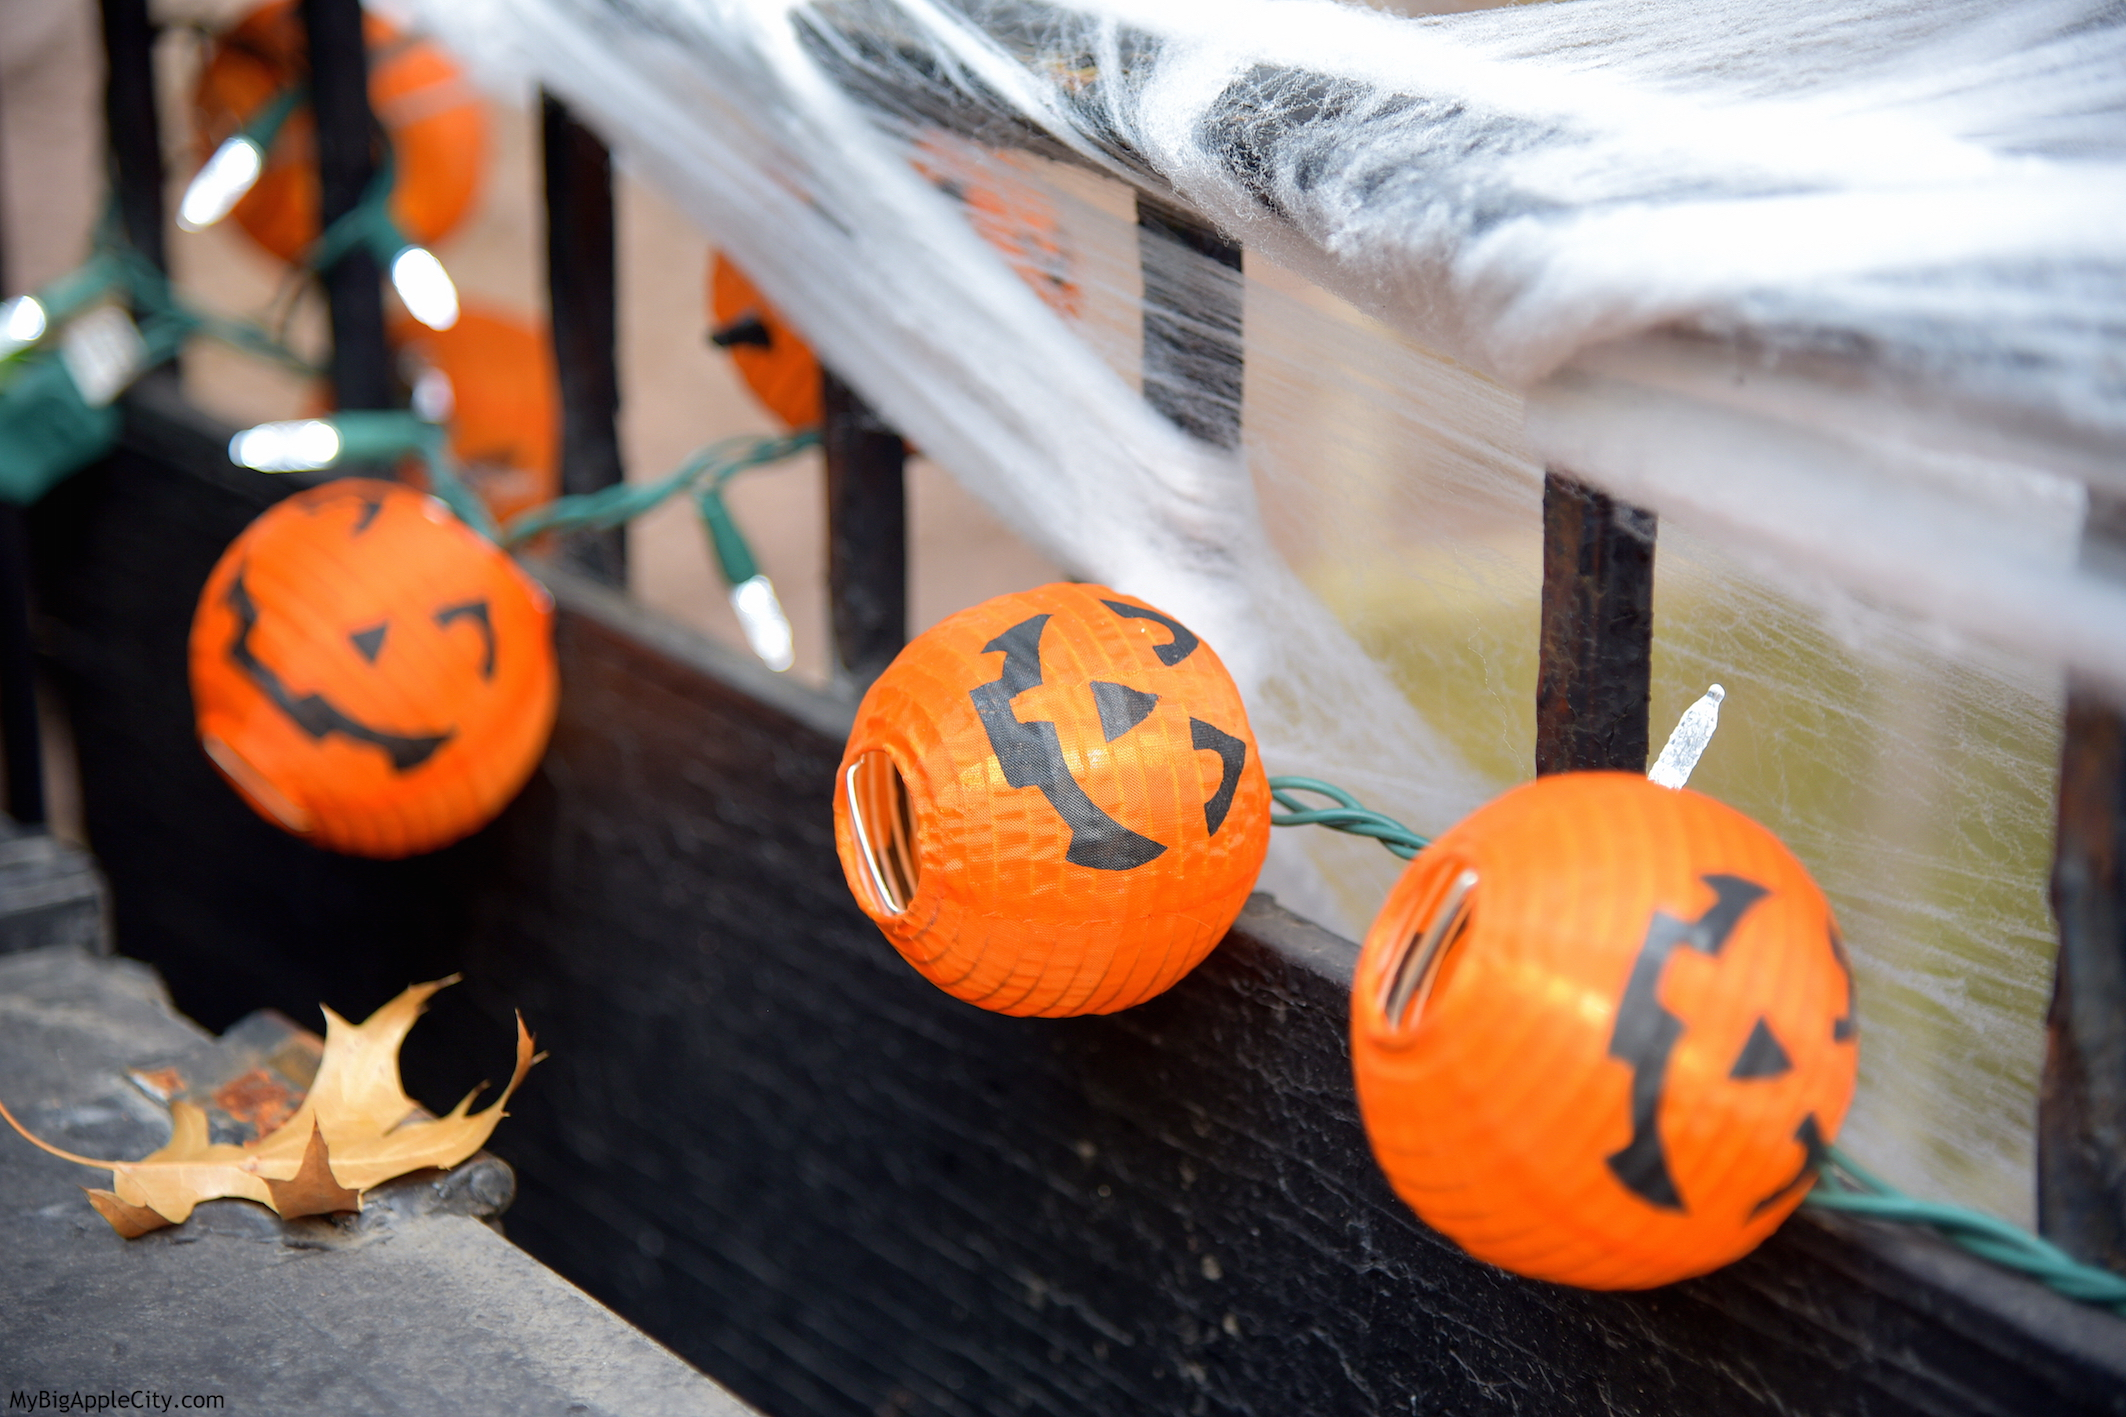 Halloween-NYC-celebration-travel-blogger-MyBigAppleCity